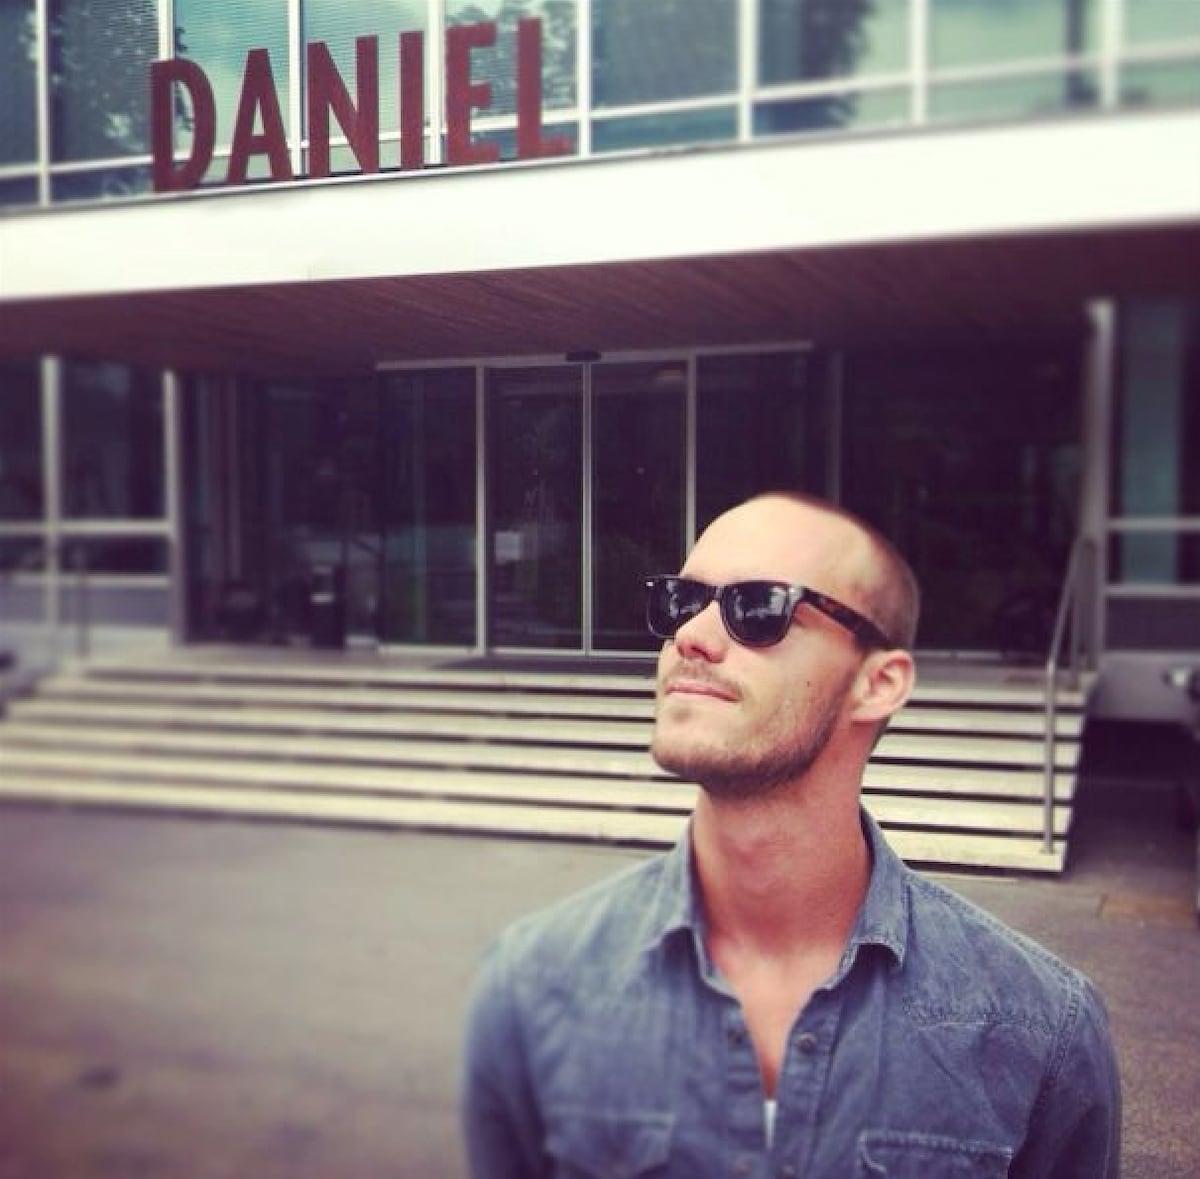 Daniel from Salzburg